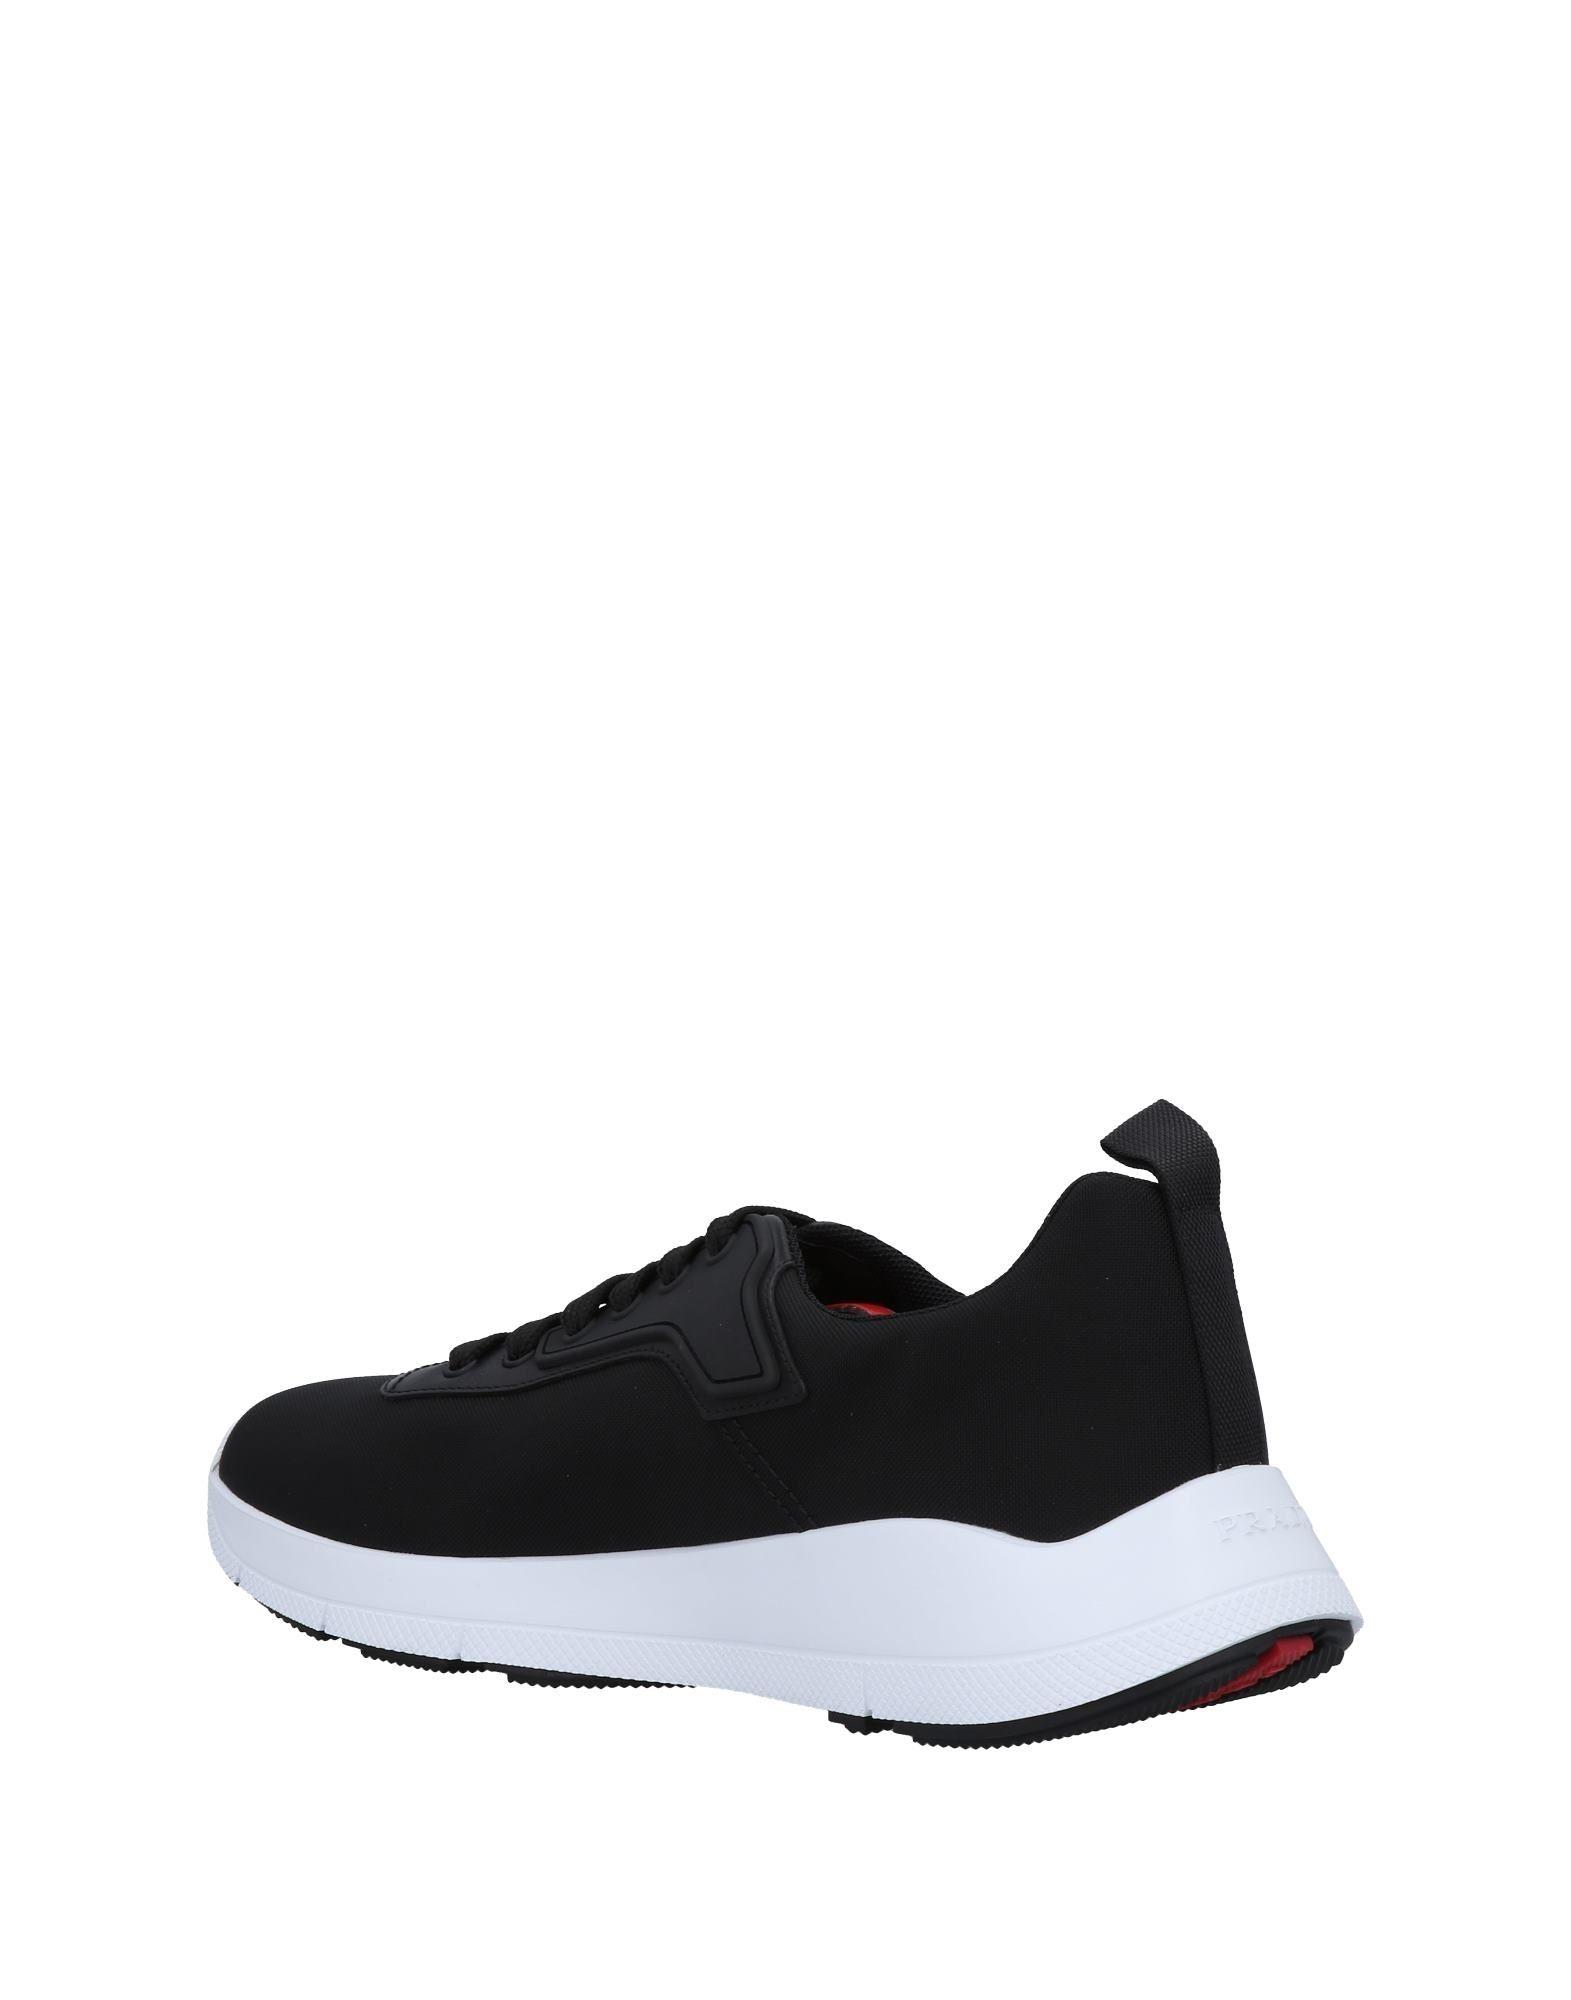 Prada 11492677DJ Sport Sneakers Herren  11492677DJ Prada Gute Qualität beliebte Schuhe f896cf